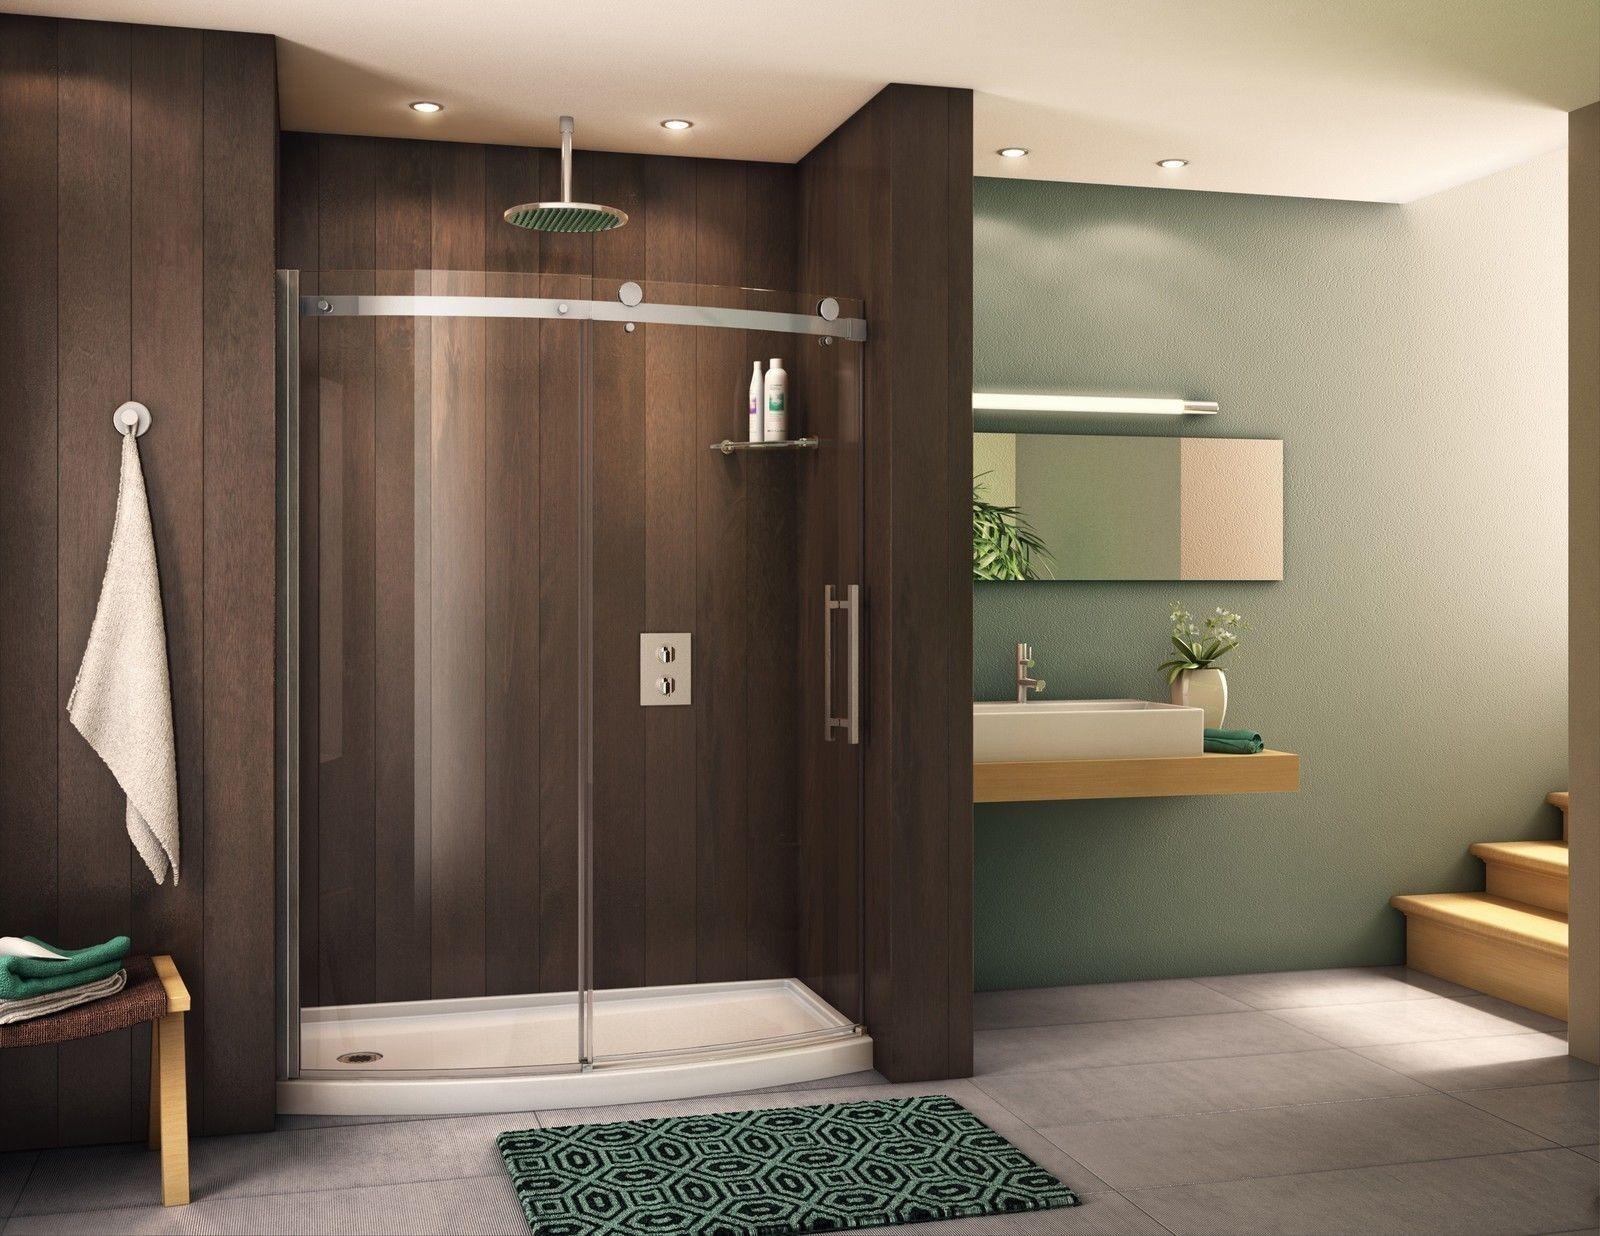 Fleurco 57 58 X 75 Novara Bowfront 5 16 Glass Curved Frameless Shower Door